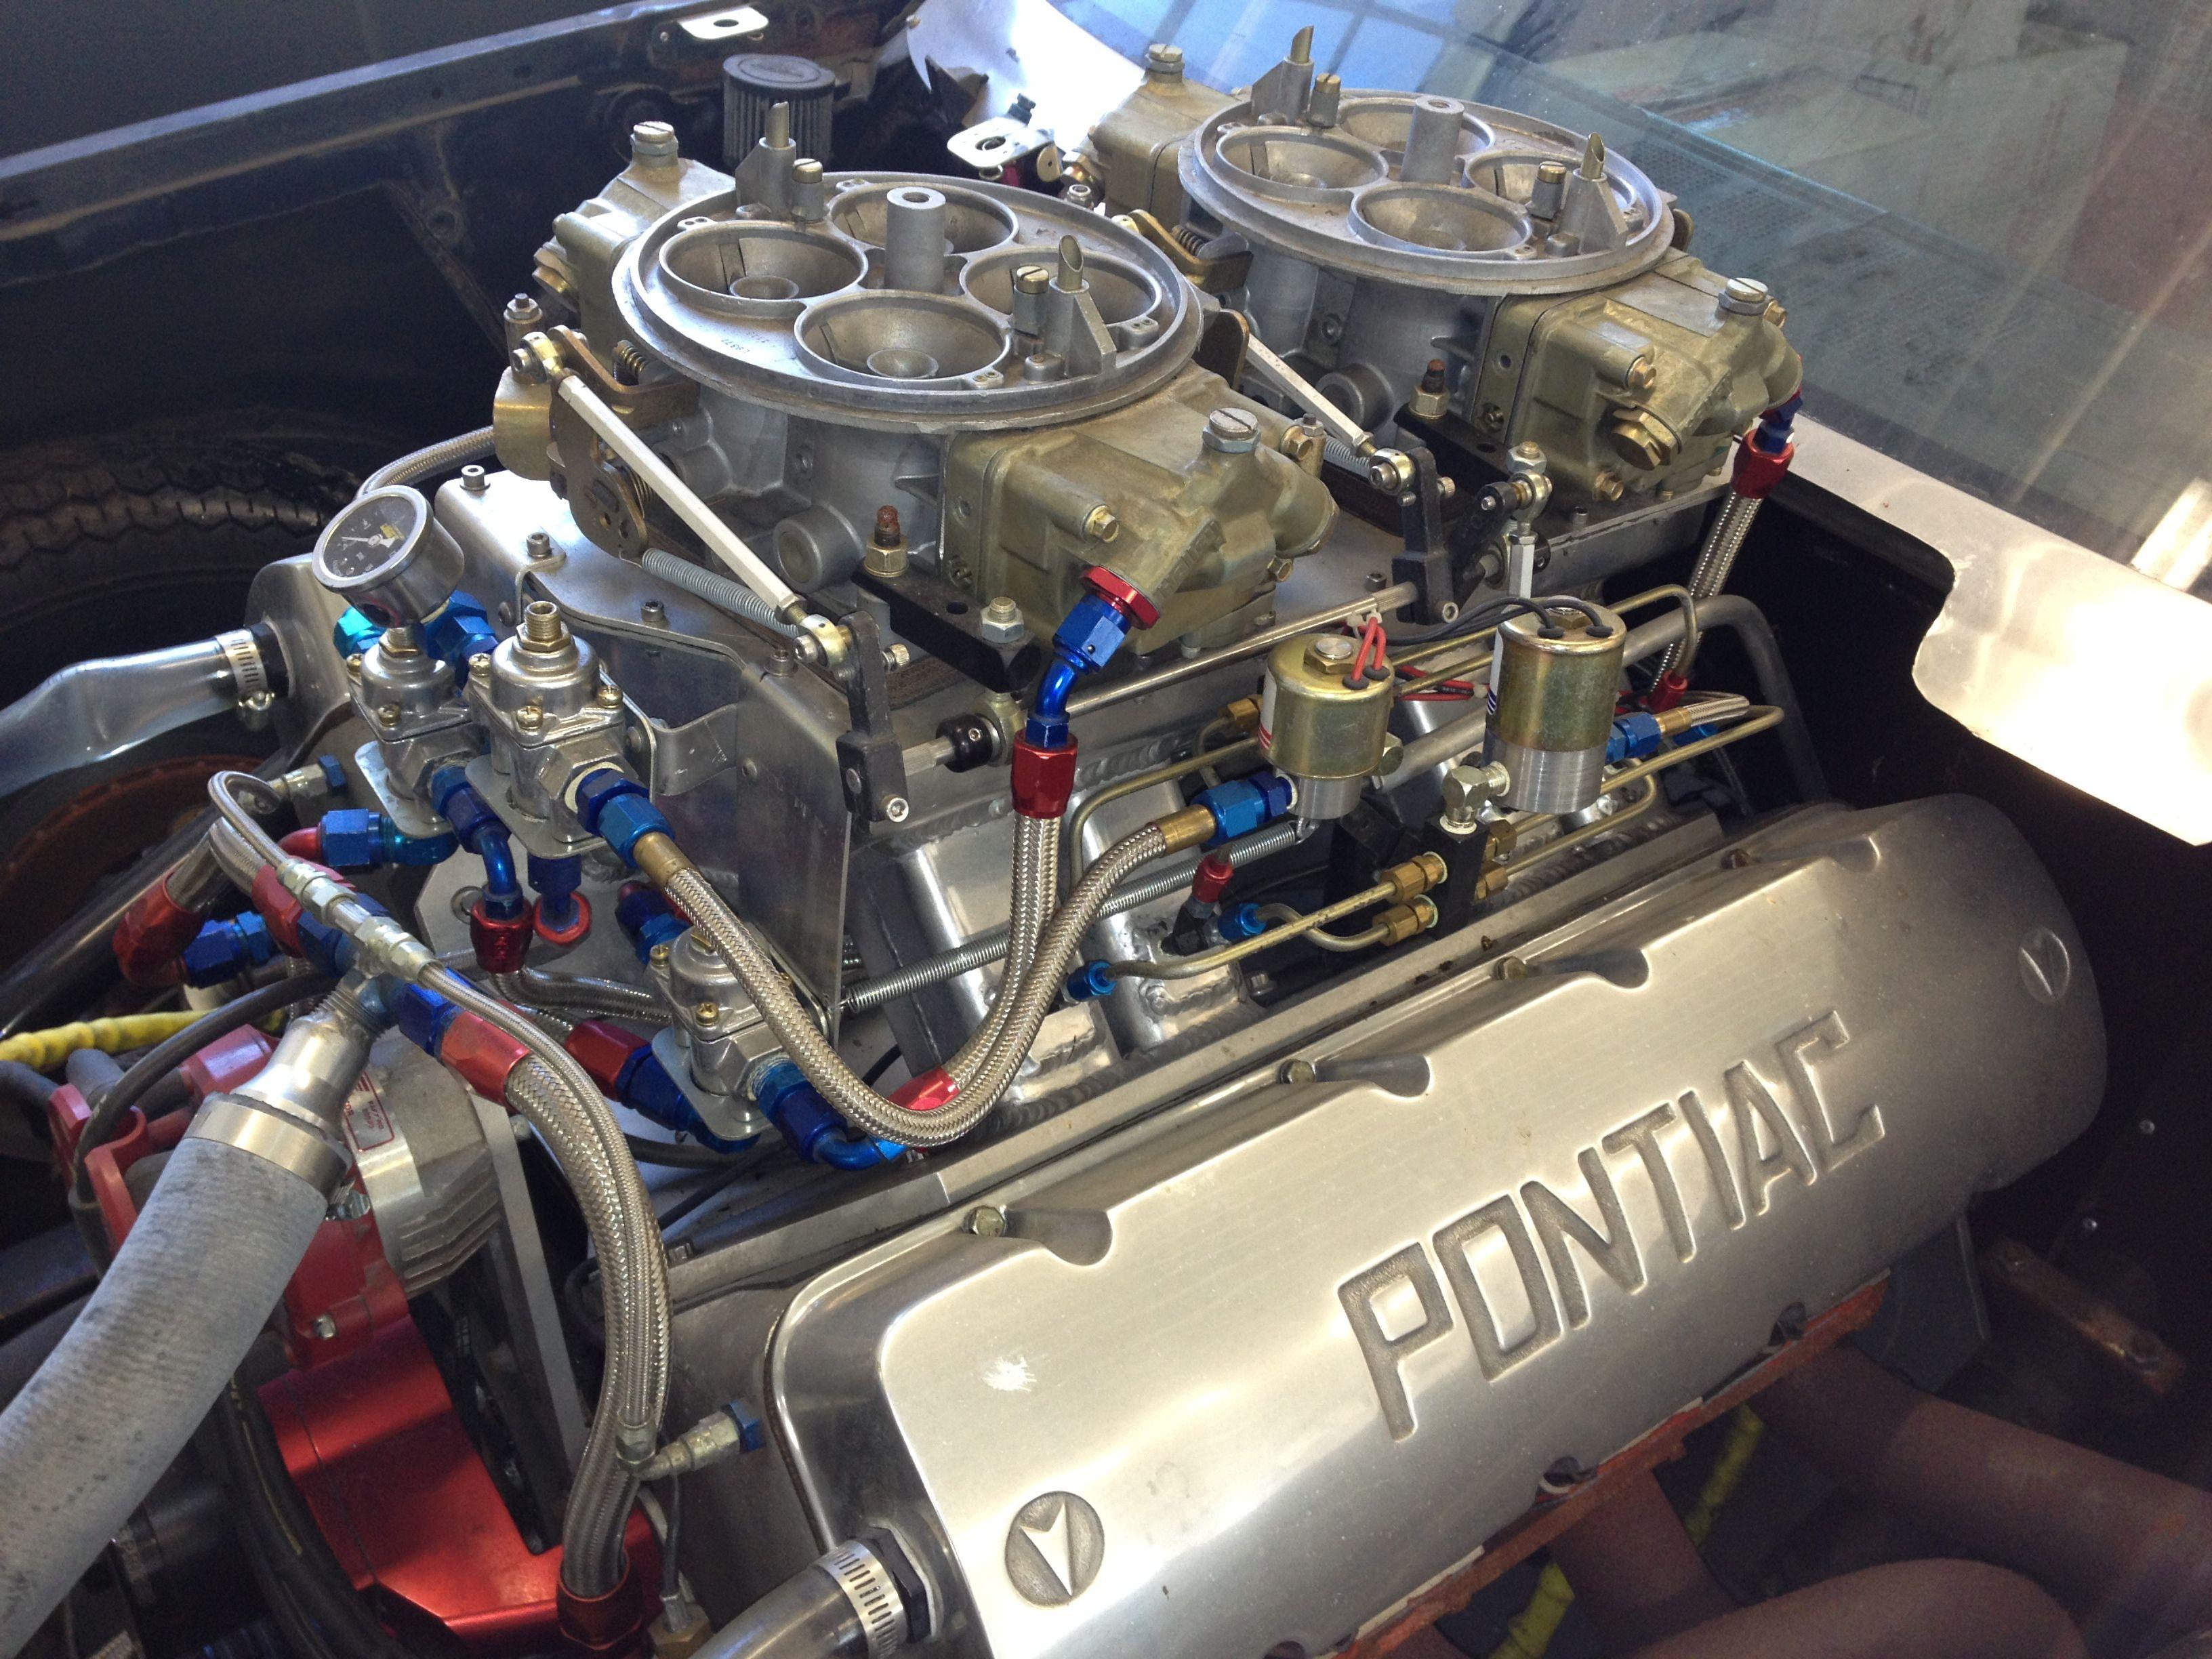 medium resolution of 572 big block chevy with pontiac 427 pro stock heads pontiac427